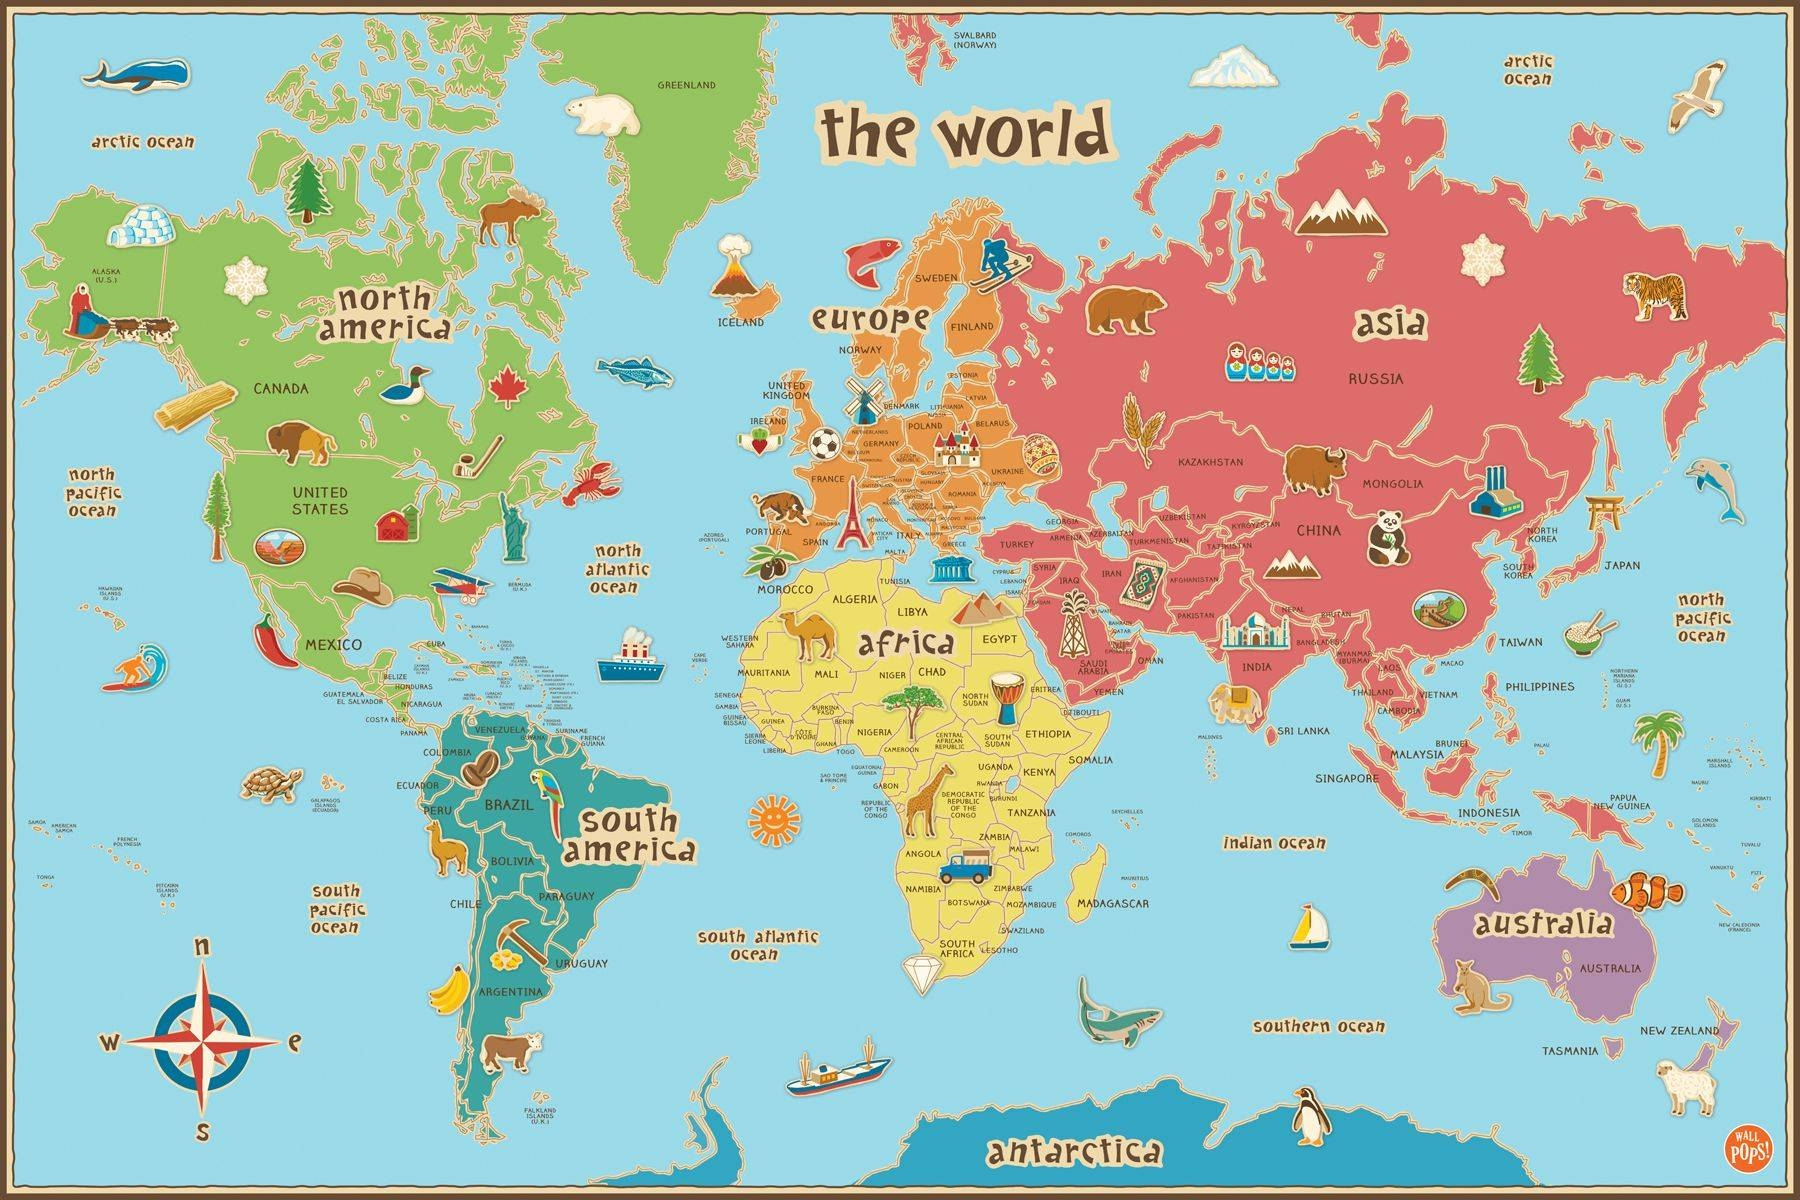 World Dry Erase Map Art Sticker With Pen Regarding Current World Map Wall Art For Kids (View 17 of 20)